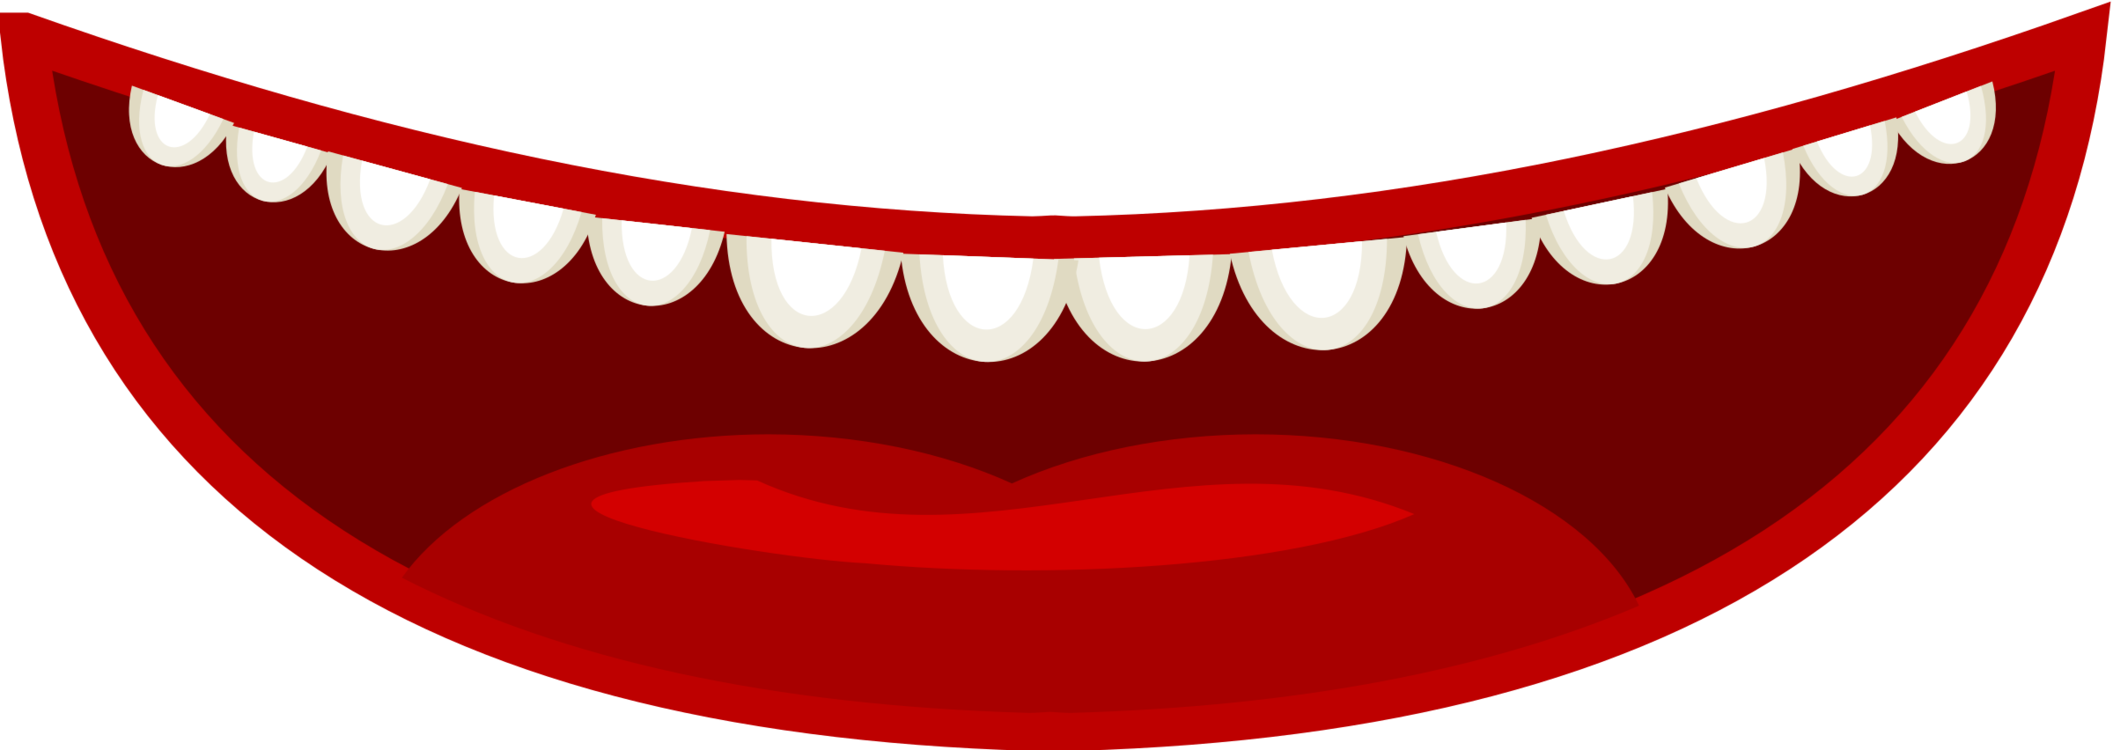 Organ,Jaw,Tooth